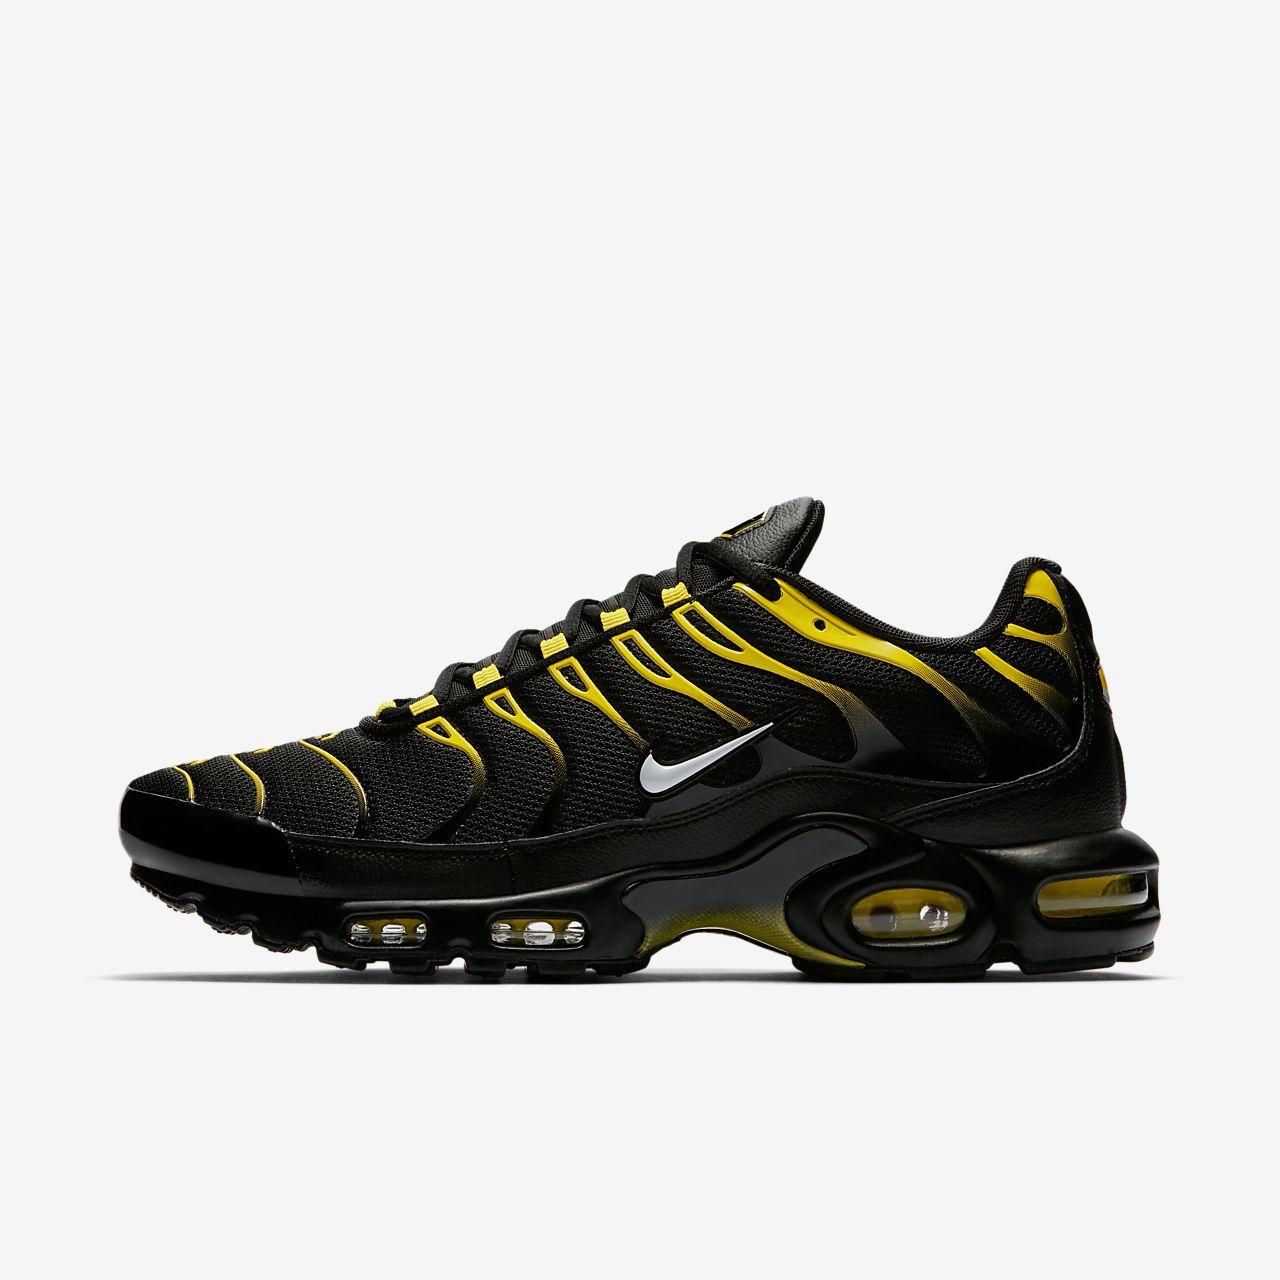 premium selection fdd3e 2f70d ... Nike Air Max Plus Mens Shoe